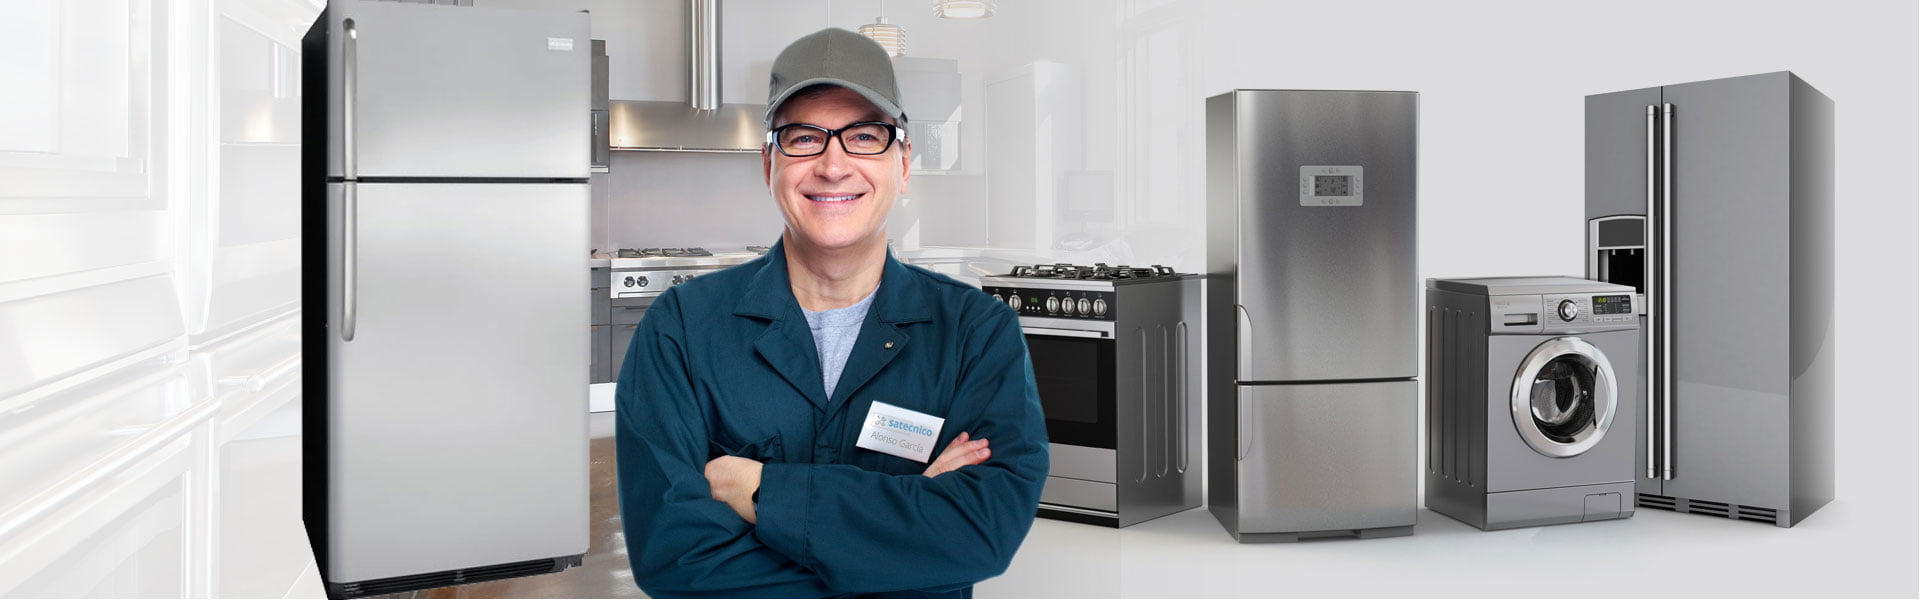 servicio-tecnico-frigorificos